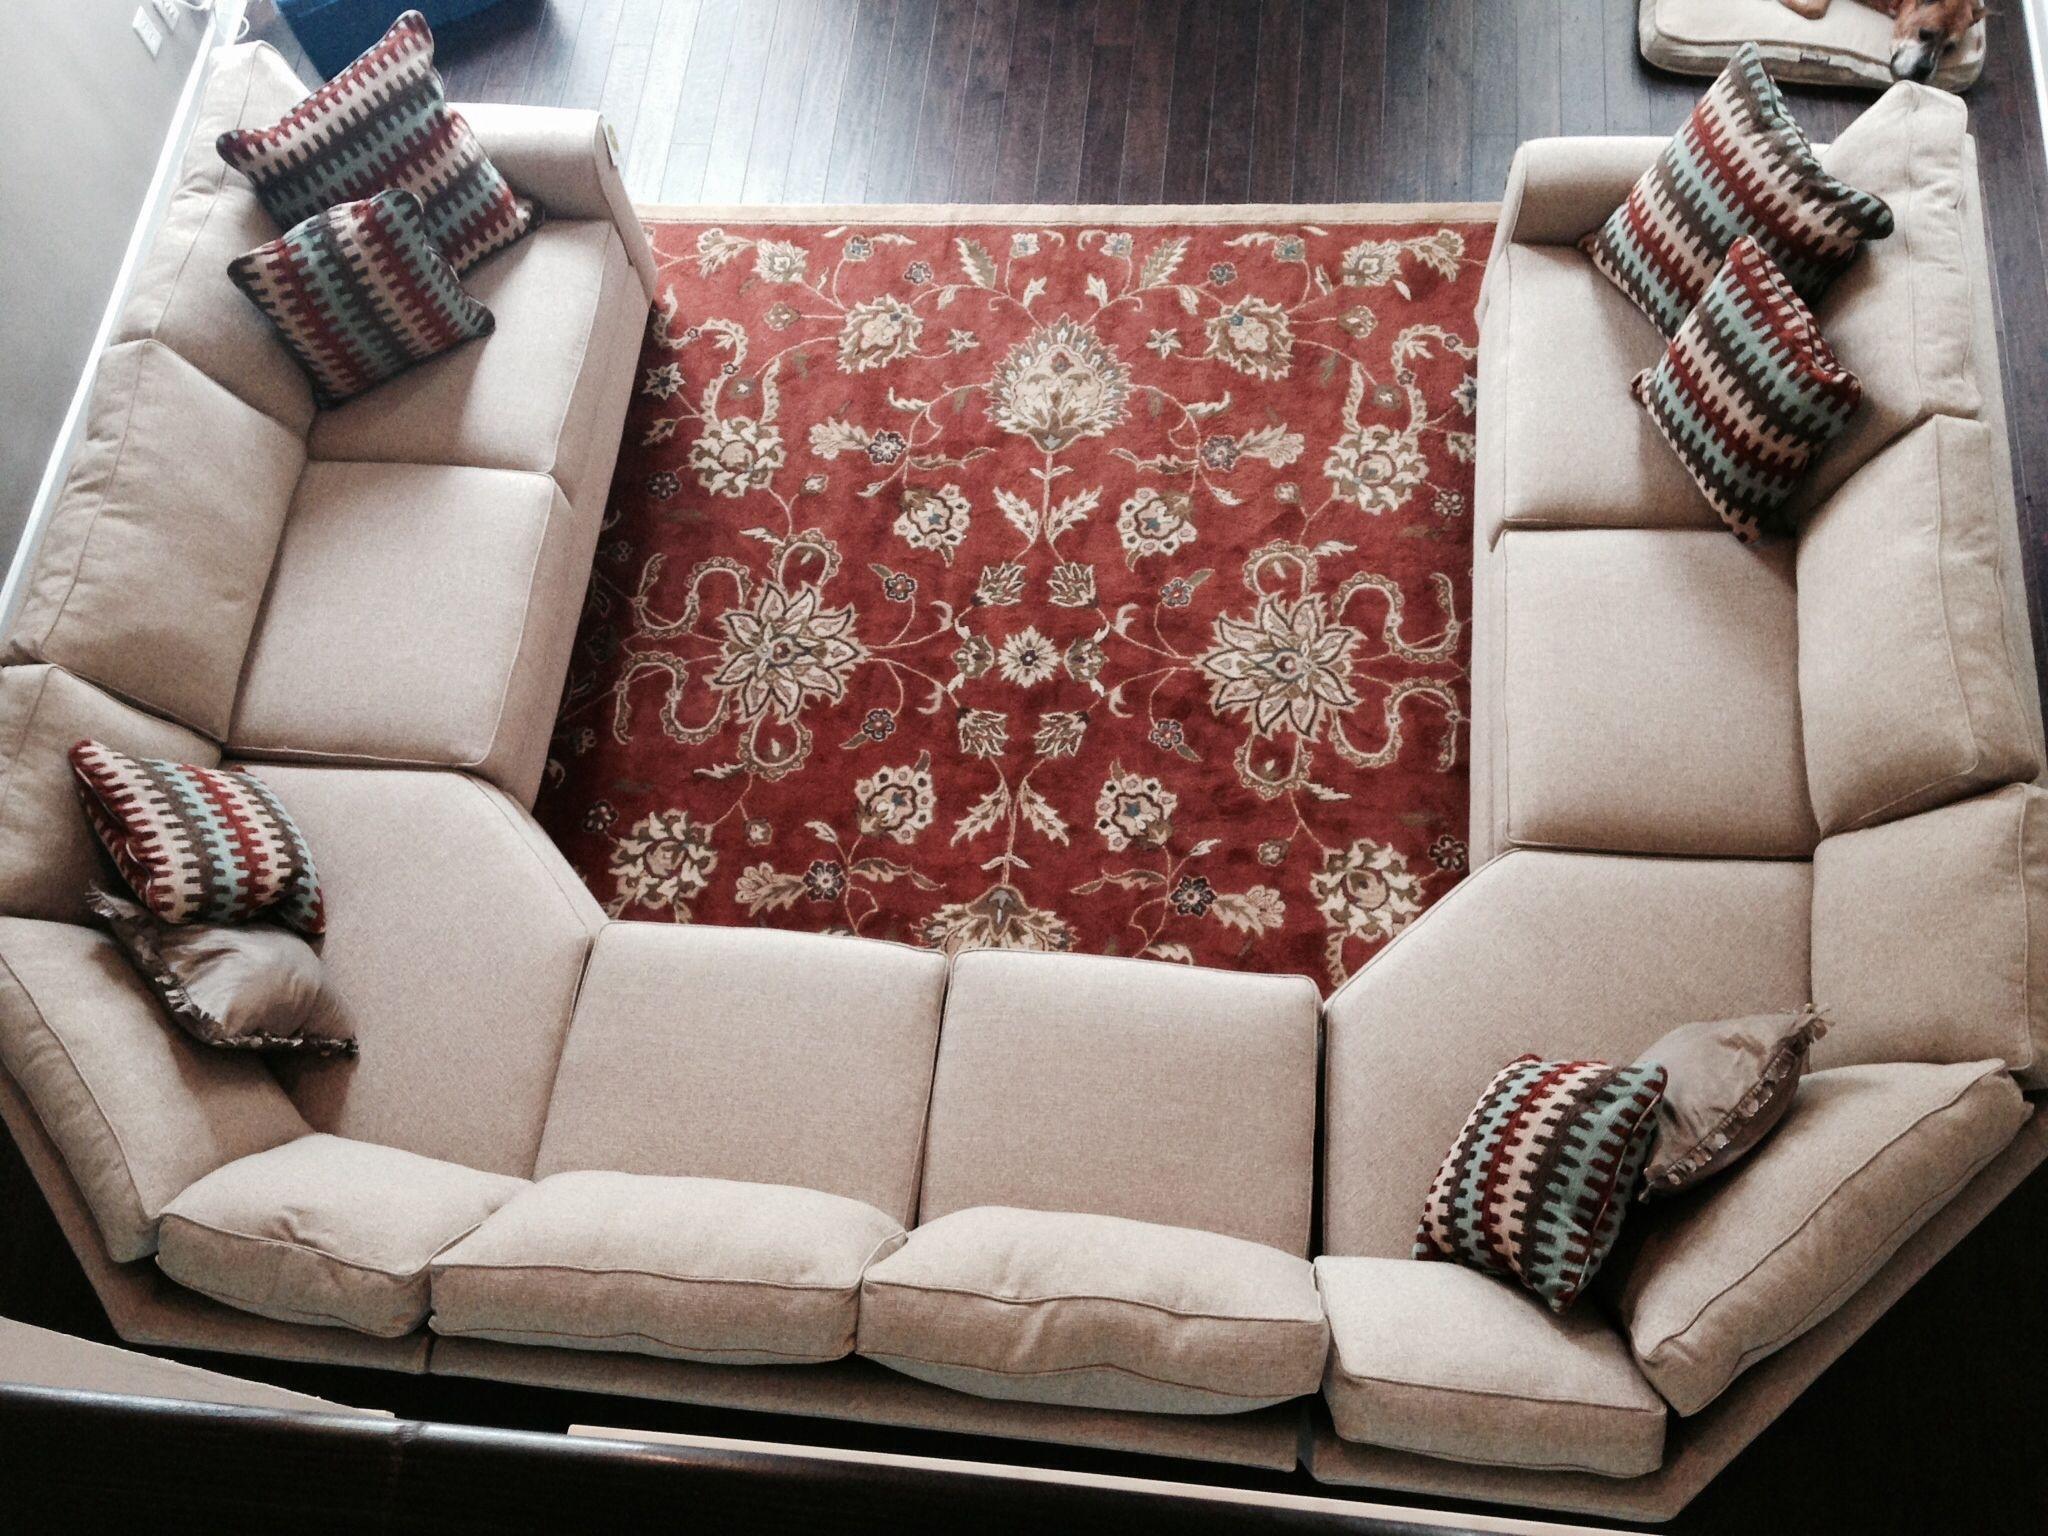 Cool U Shaped Sectional Sofas , Awesome U Shaped Sectional Sofas 44 For Blue U Shaped Sectionals (View 3 of 10)